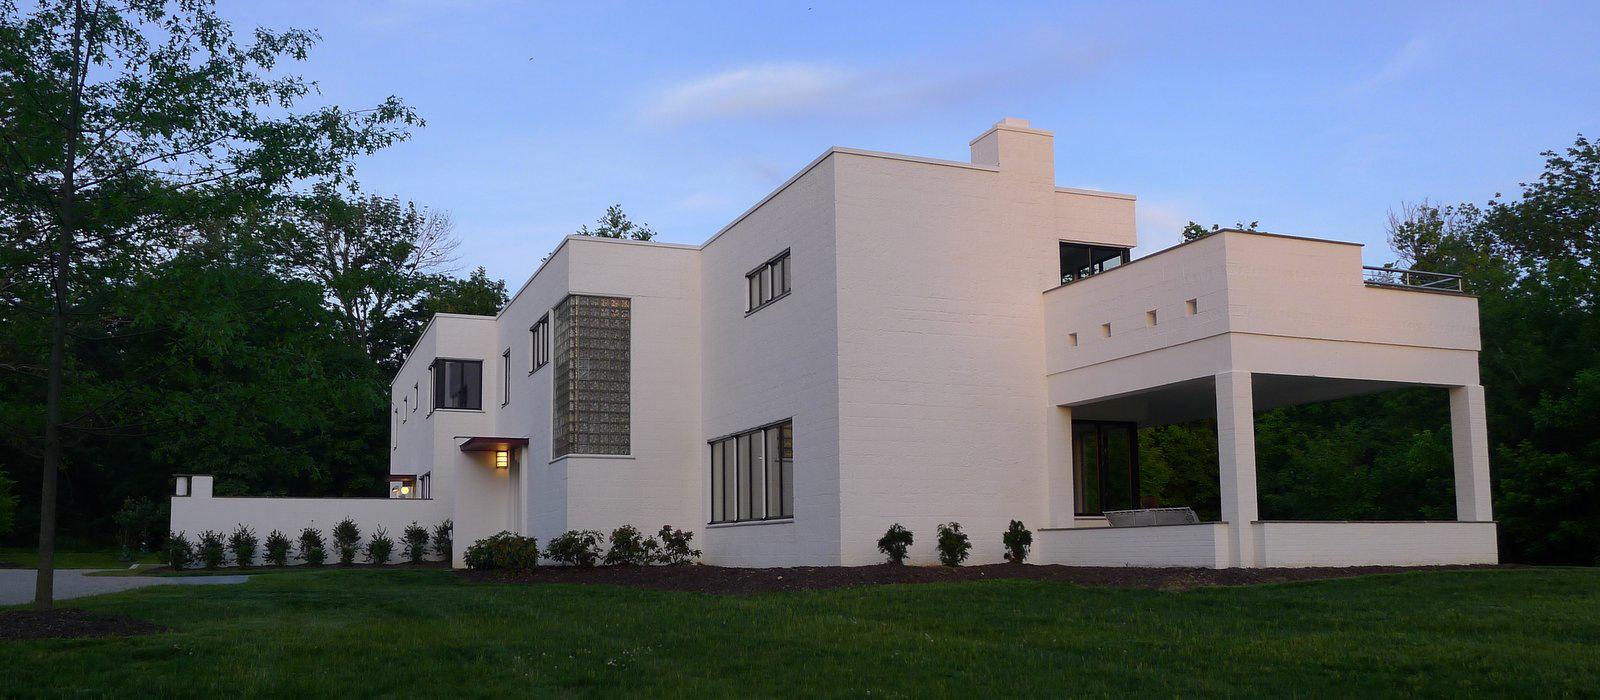 international style house plans. Black Bedroom Furniture Sets. Home Design Ideas